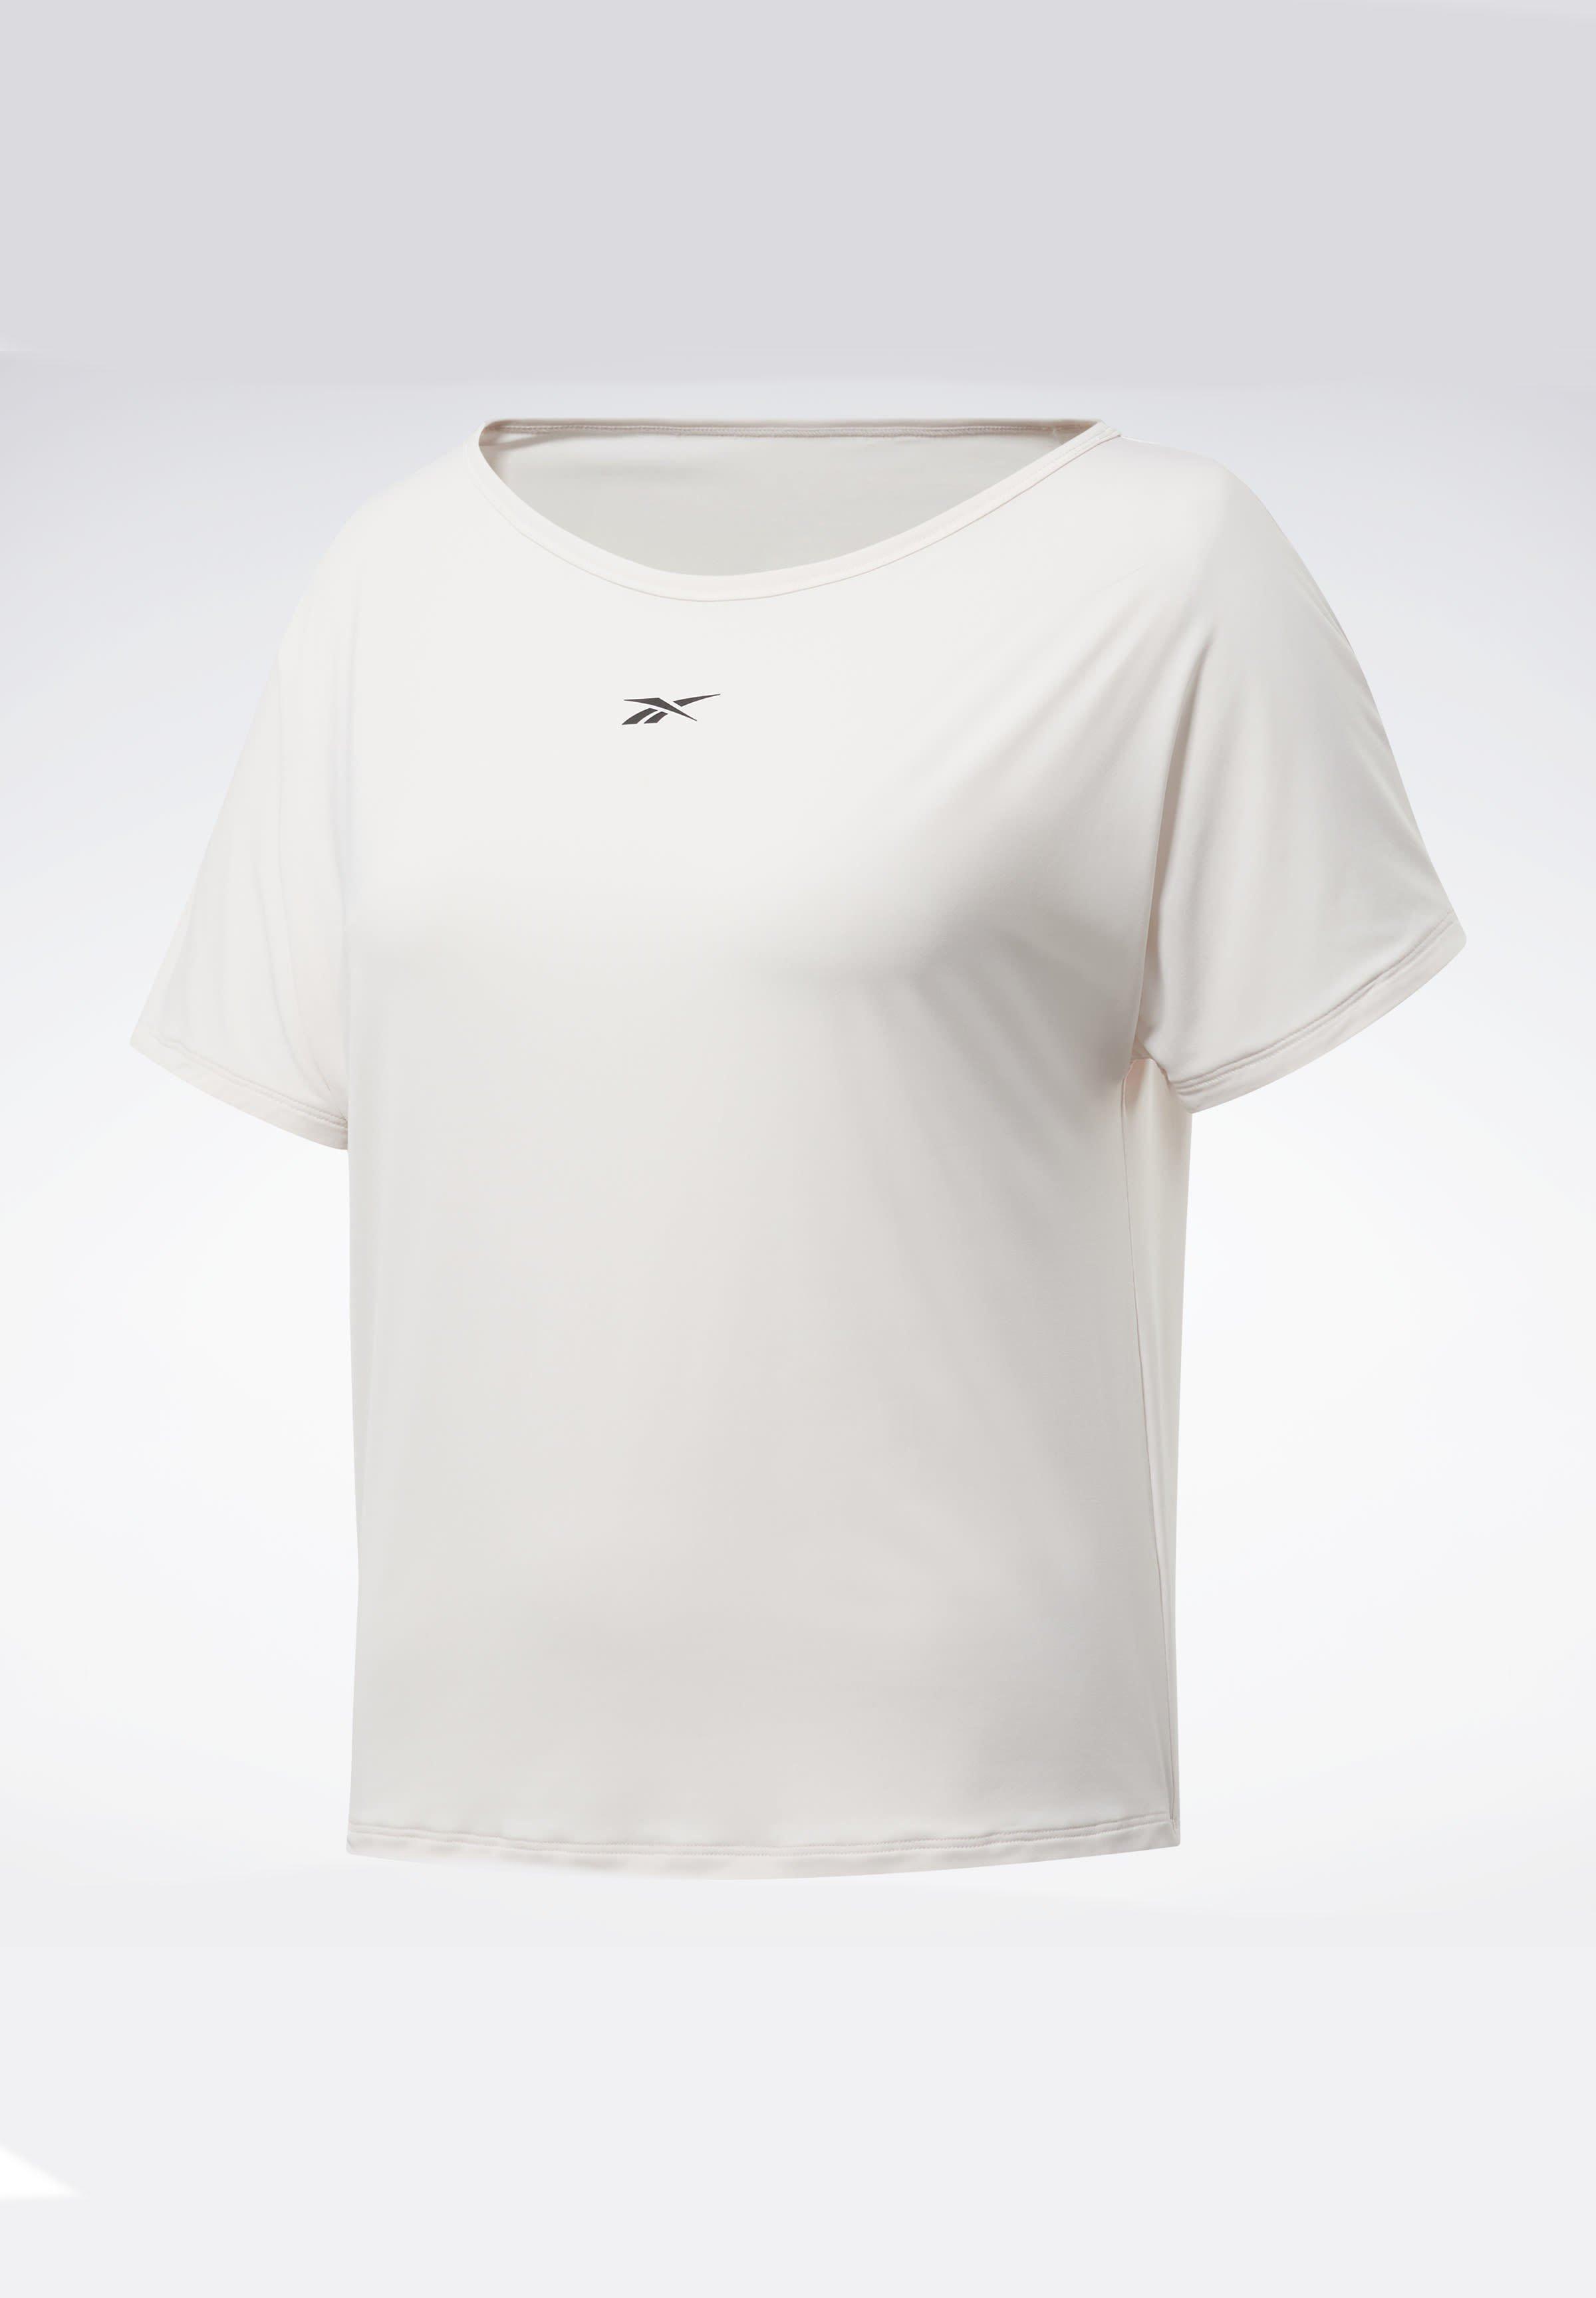 Reebok Sports shirt - pink B6ypY